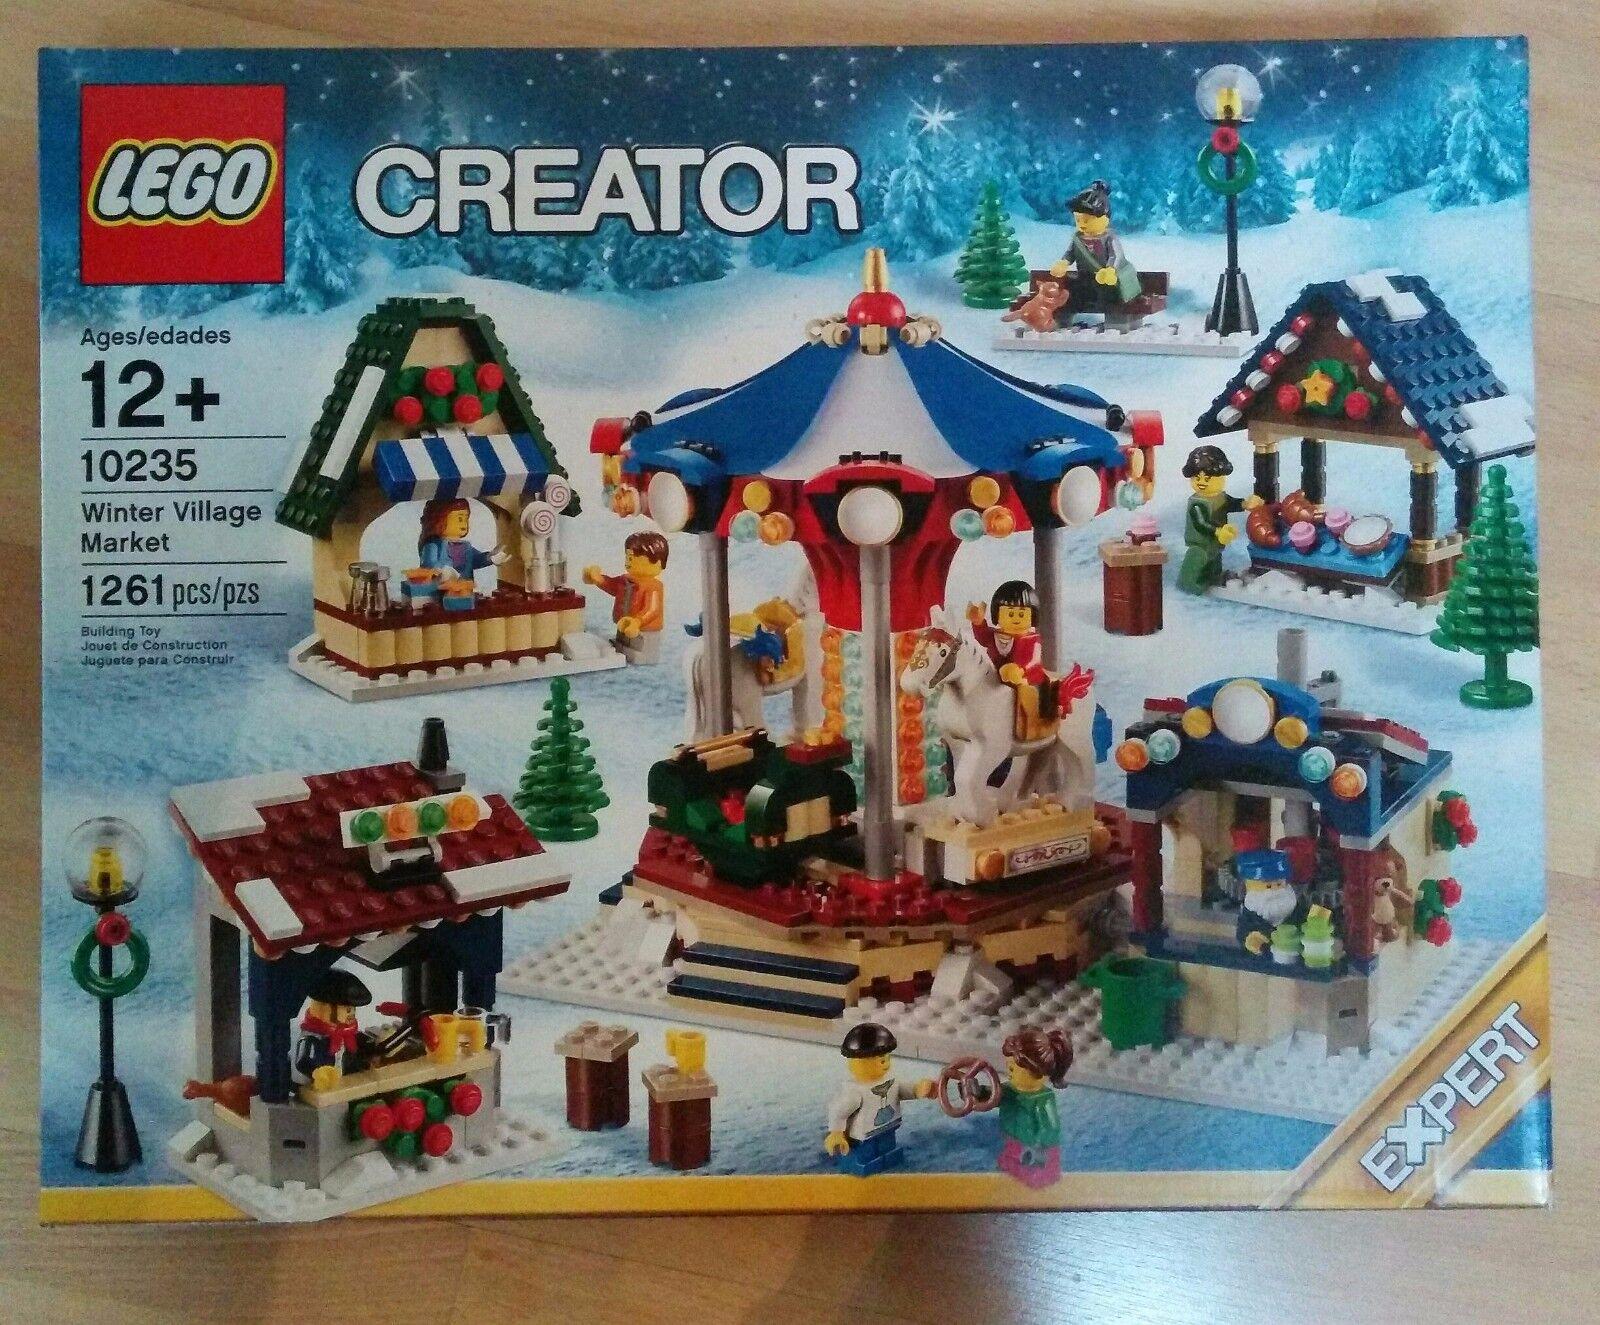 LEGO  10235 Winter Village Market  promotions discount